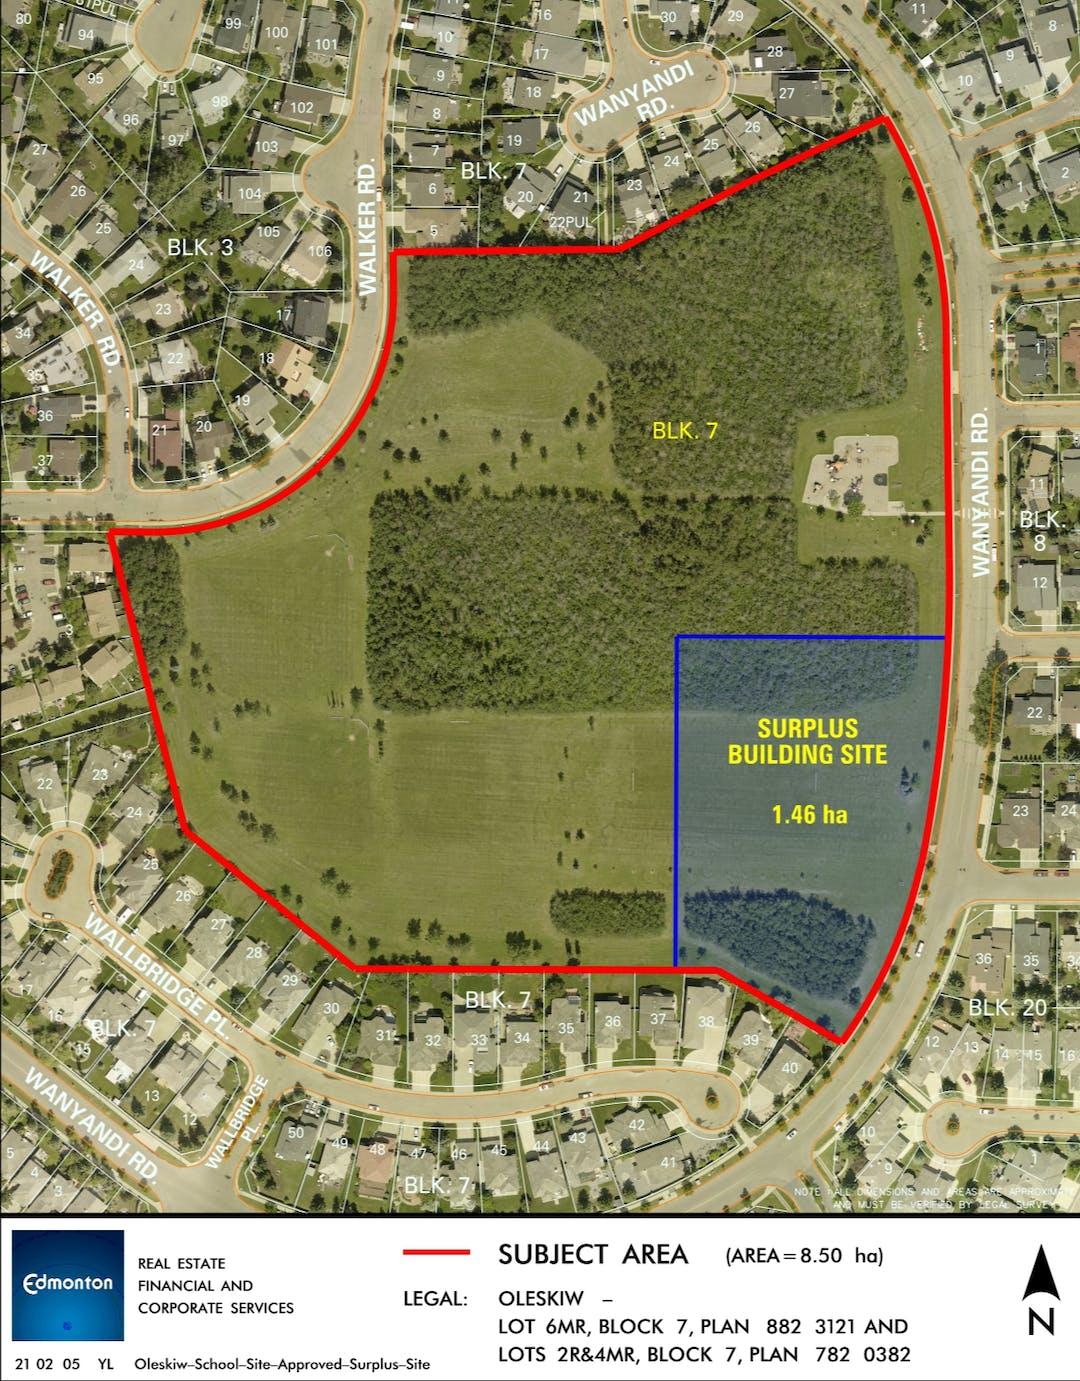 The Location of surplus school site within Oleskiw Park